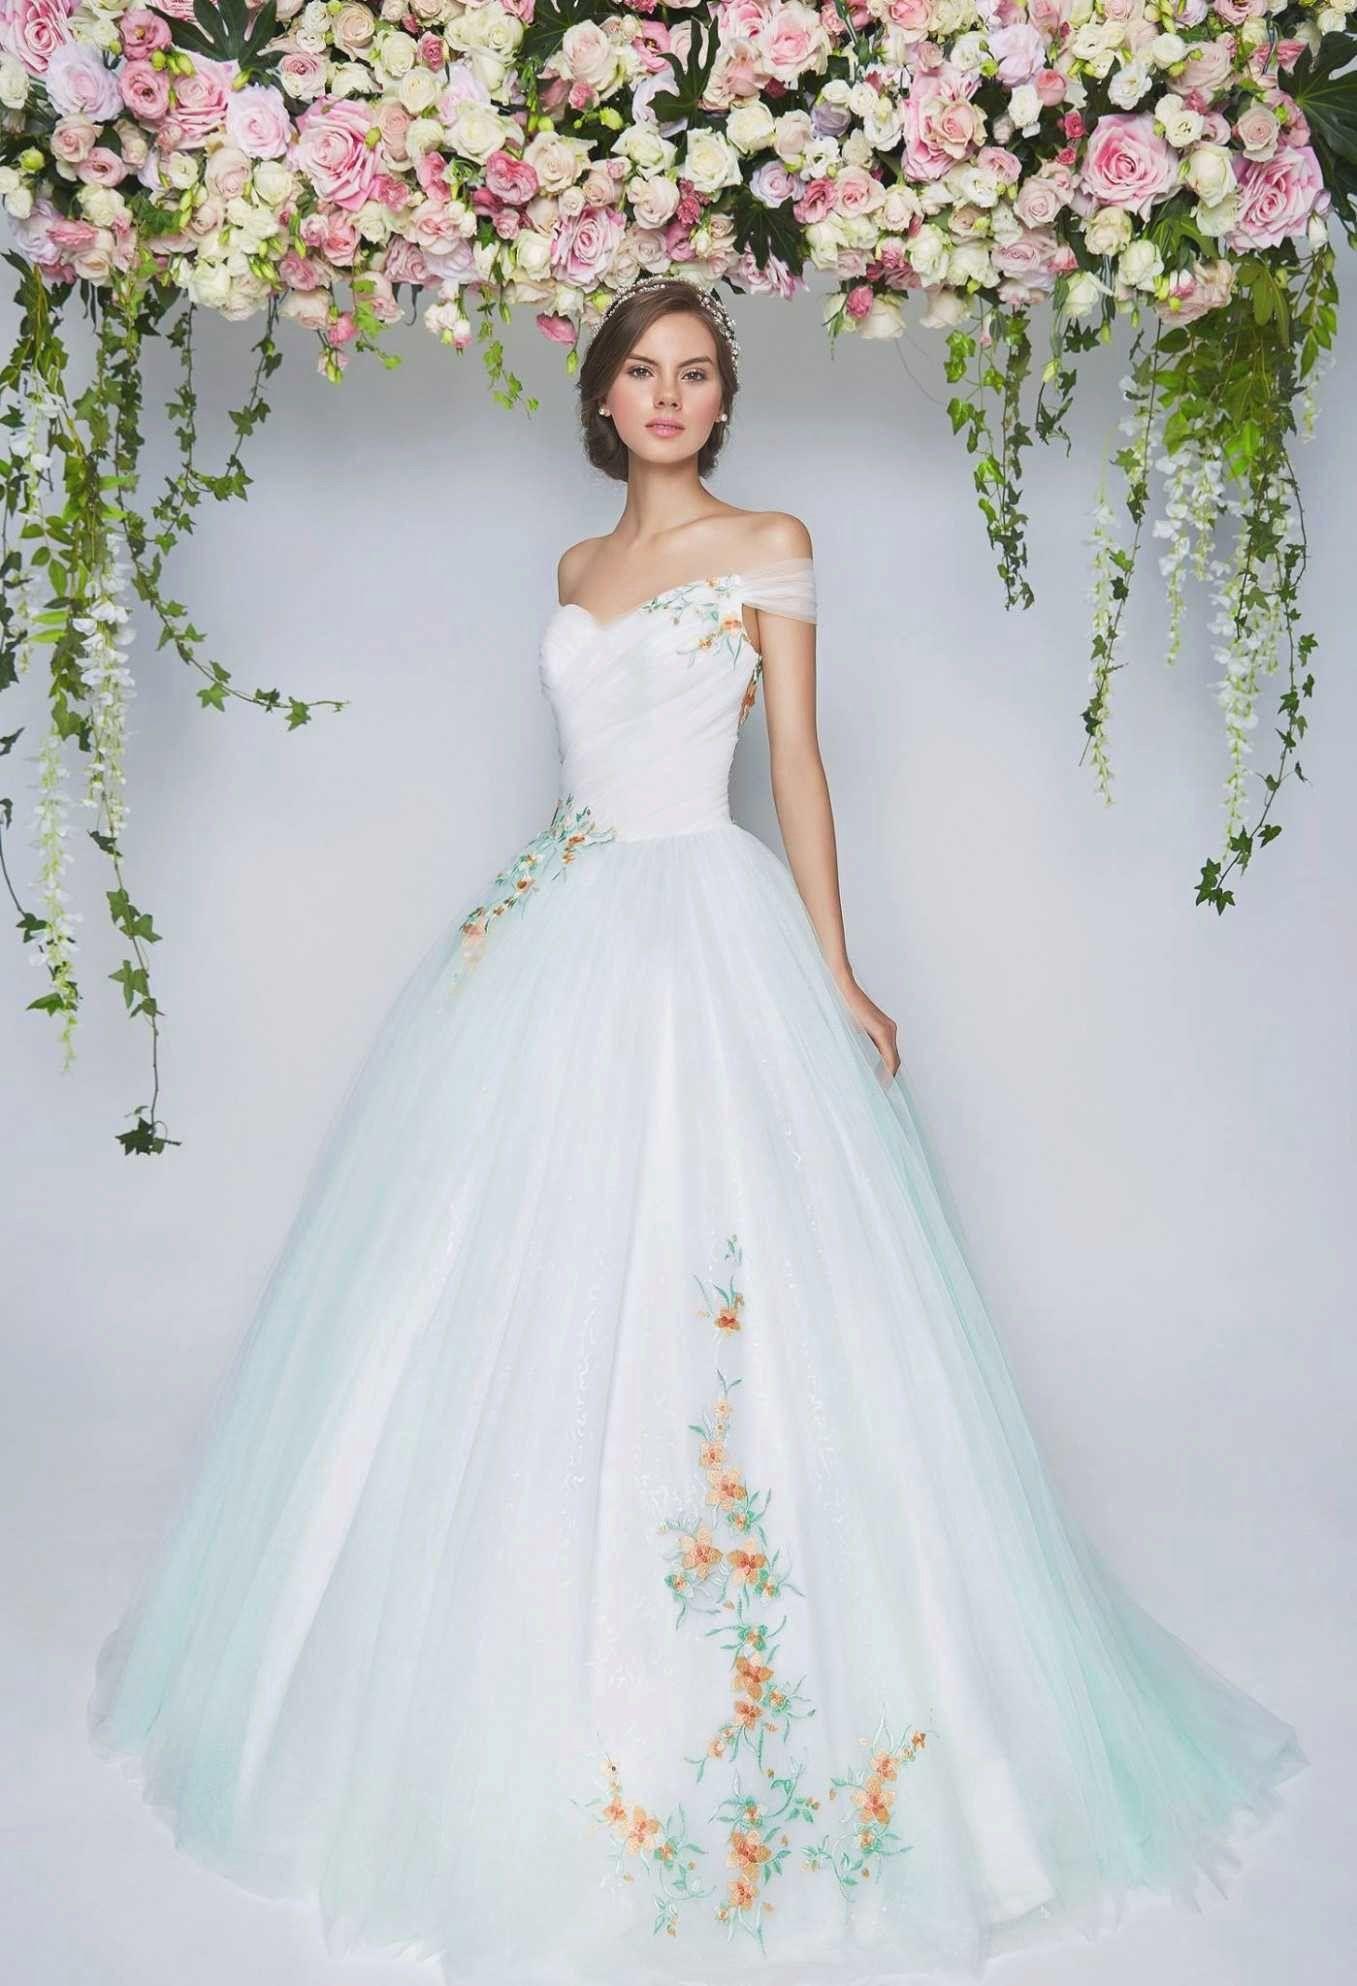 Bohemian Wedding Dress Los Angeles In 2020 Rental Wedding Dresses Wedding Dresses Los Angeles Amazing Wedding Dress